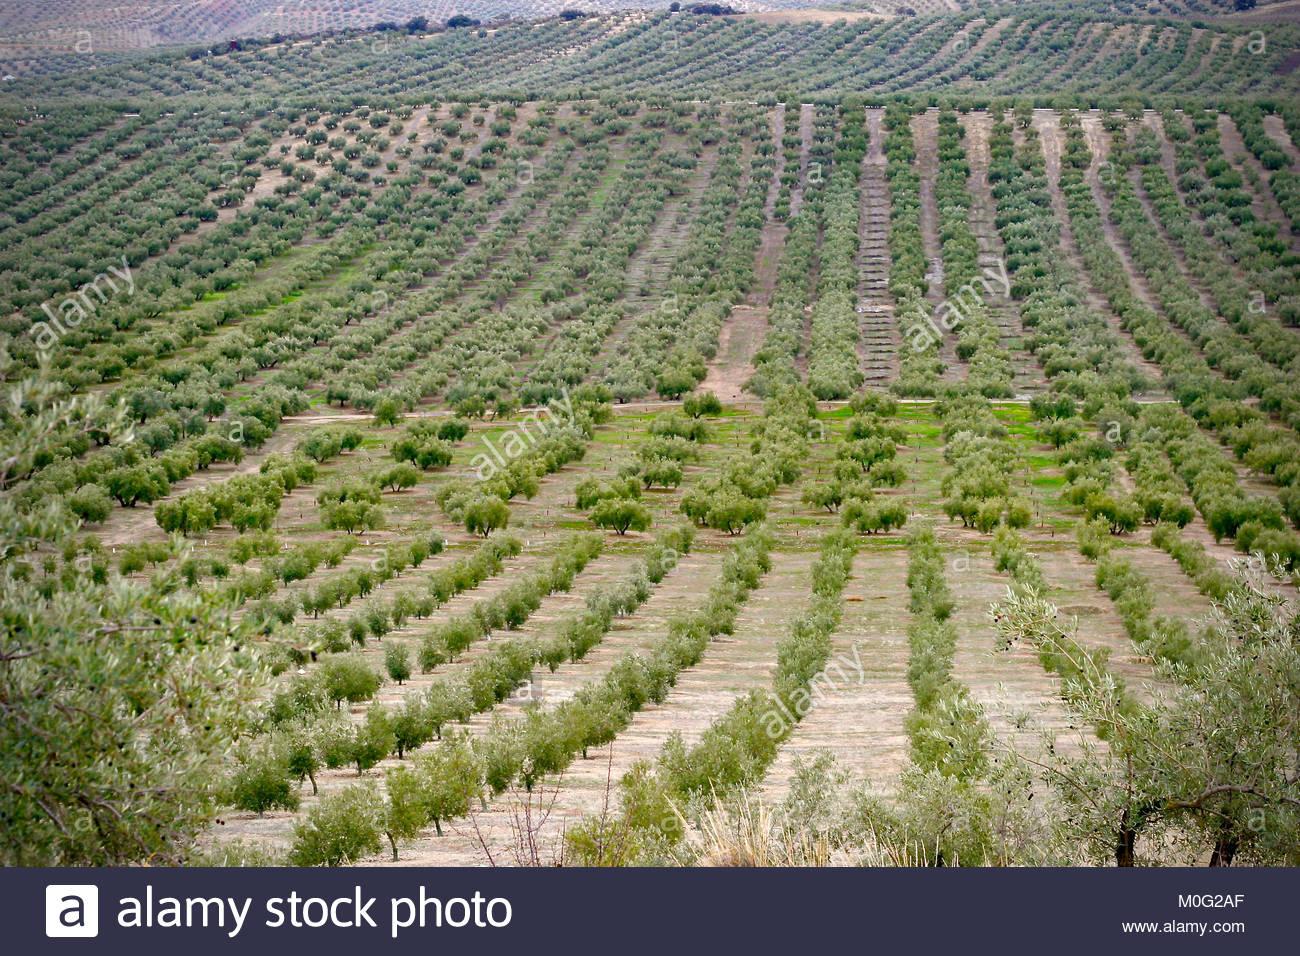 Olive groves in Priego de Cordoba, Andalucia, Spain - Stock Image